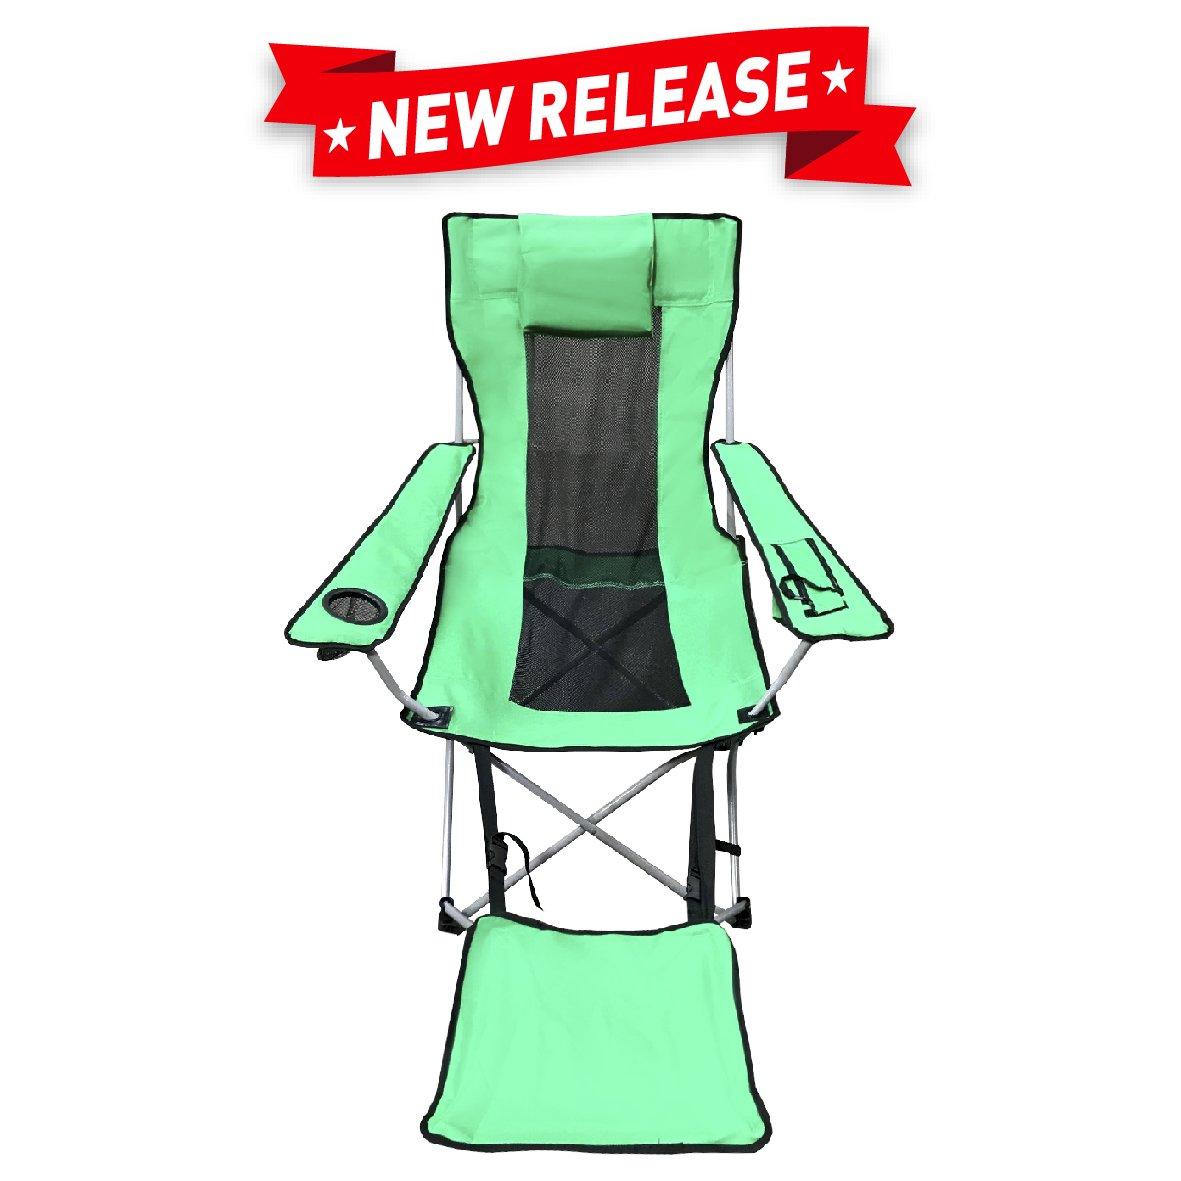 Easygoキャンプ椅子 – 軽量、折りたたみ式、リクライニング脚Restキャンプ椅子 – Camping Chair withフットレスト B0759YHGBM グリーン グリーン